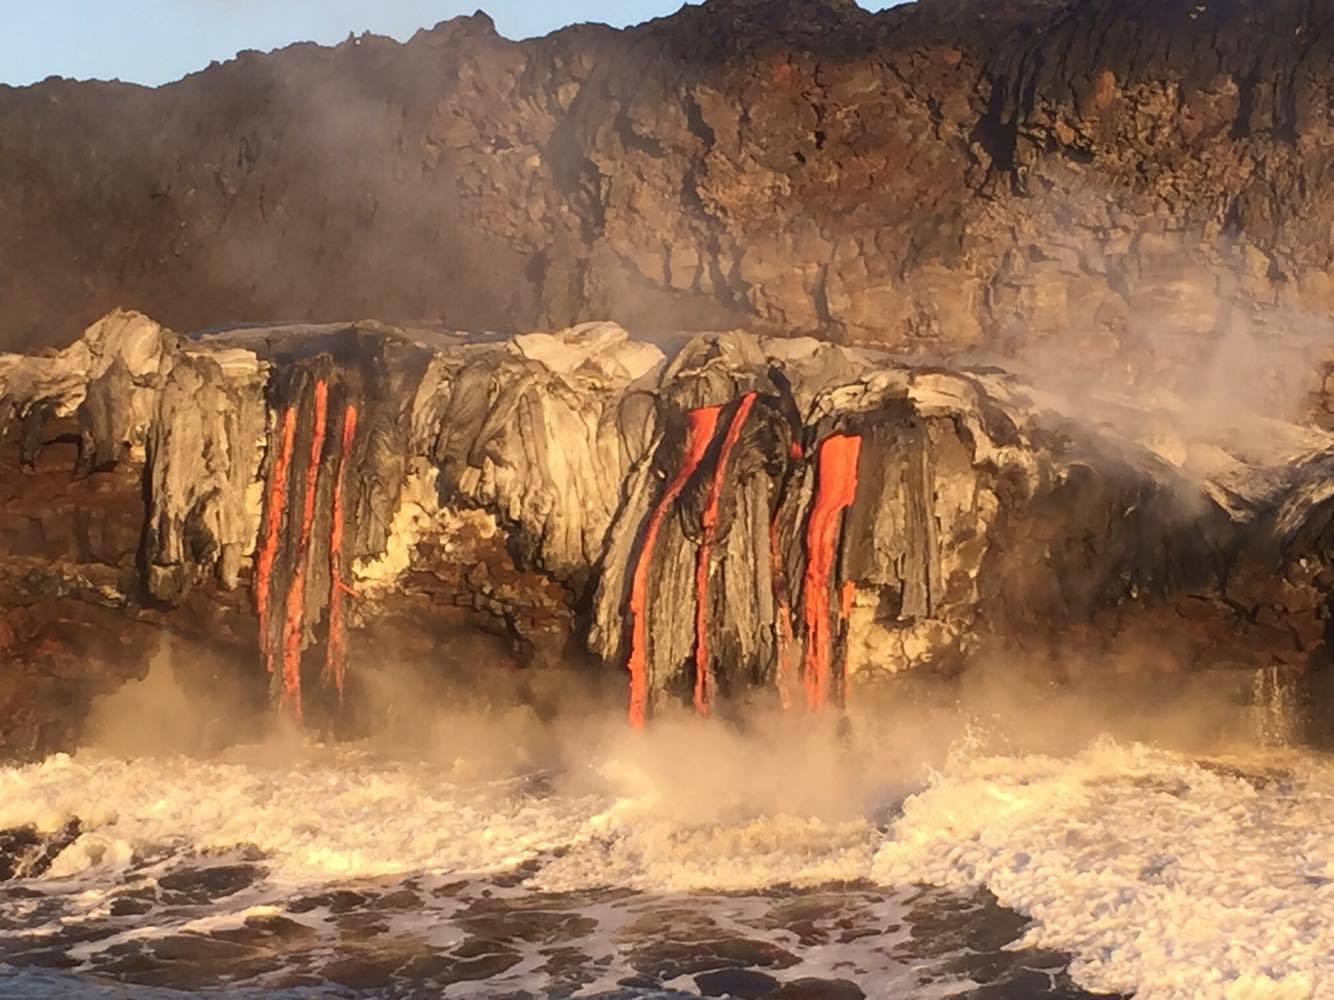 Kīlauea lava ocean entry, 10.13.16. PC: Robin Pilus, special thanks to Captain Skosh - Hoʻokupu Lava Tours.